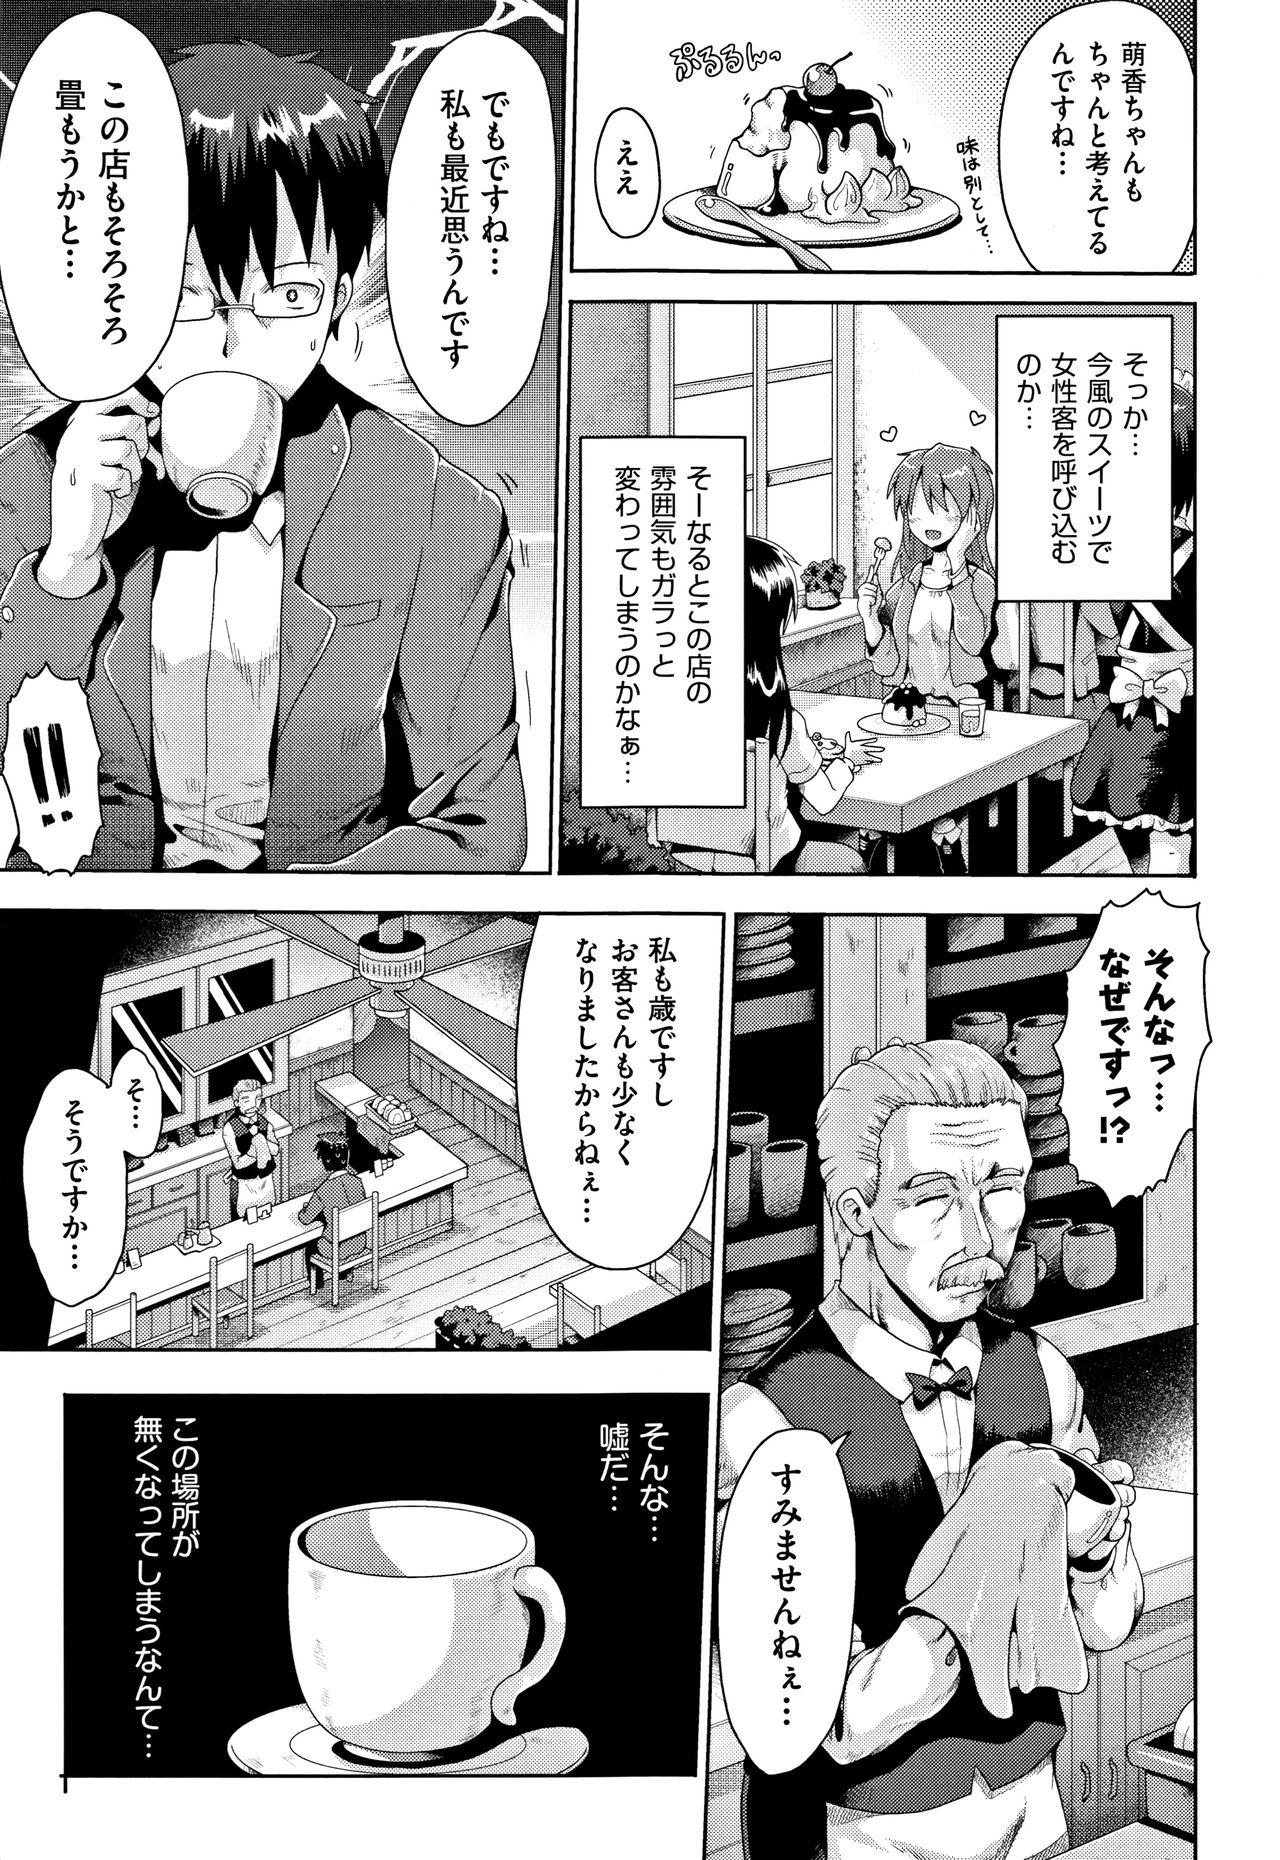 Kokugo Sansuu Rika Sex 173